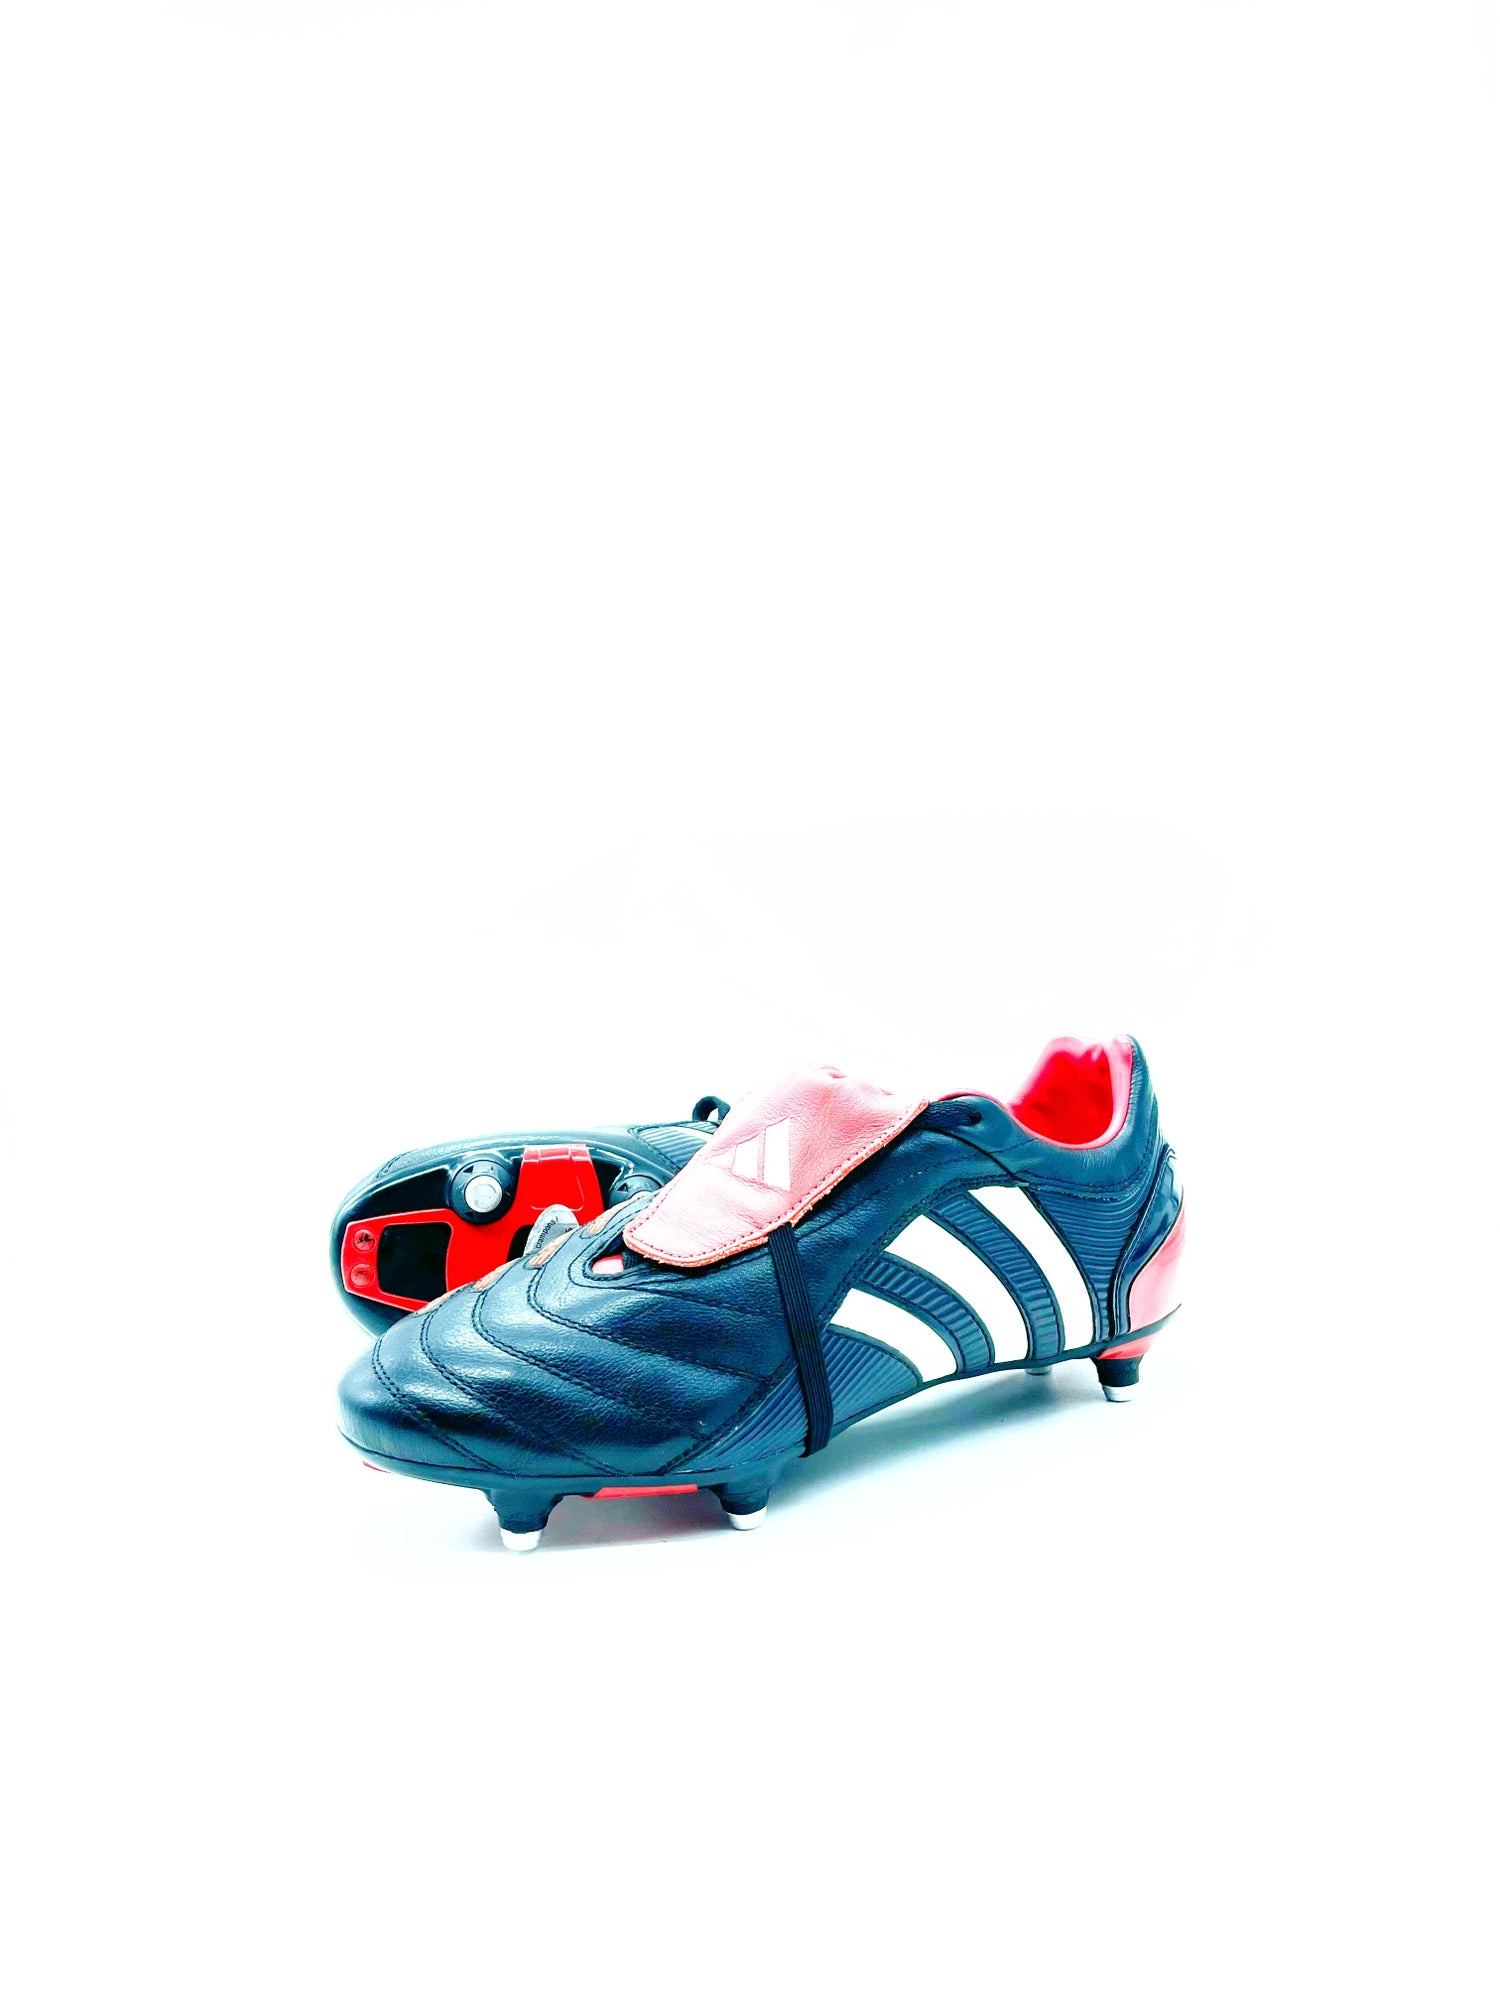 Image of Adidas Predator Pulsion TRX FG or SG